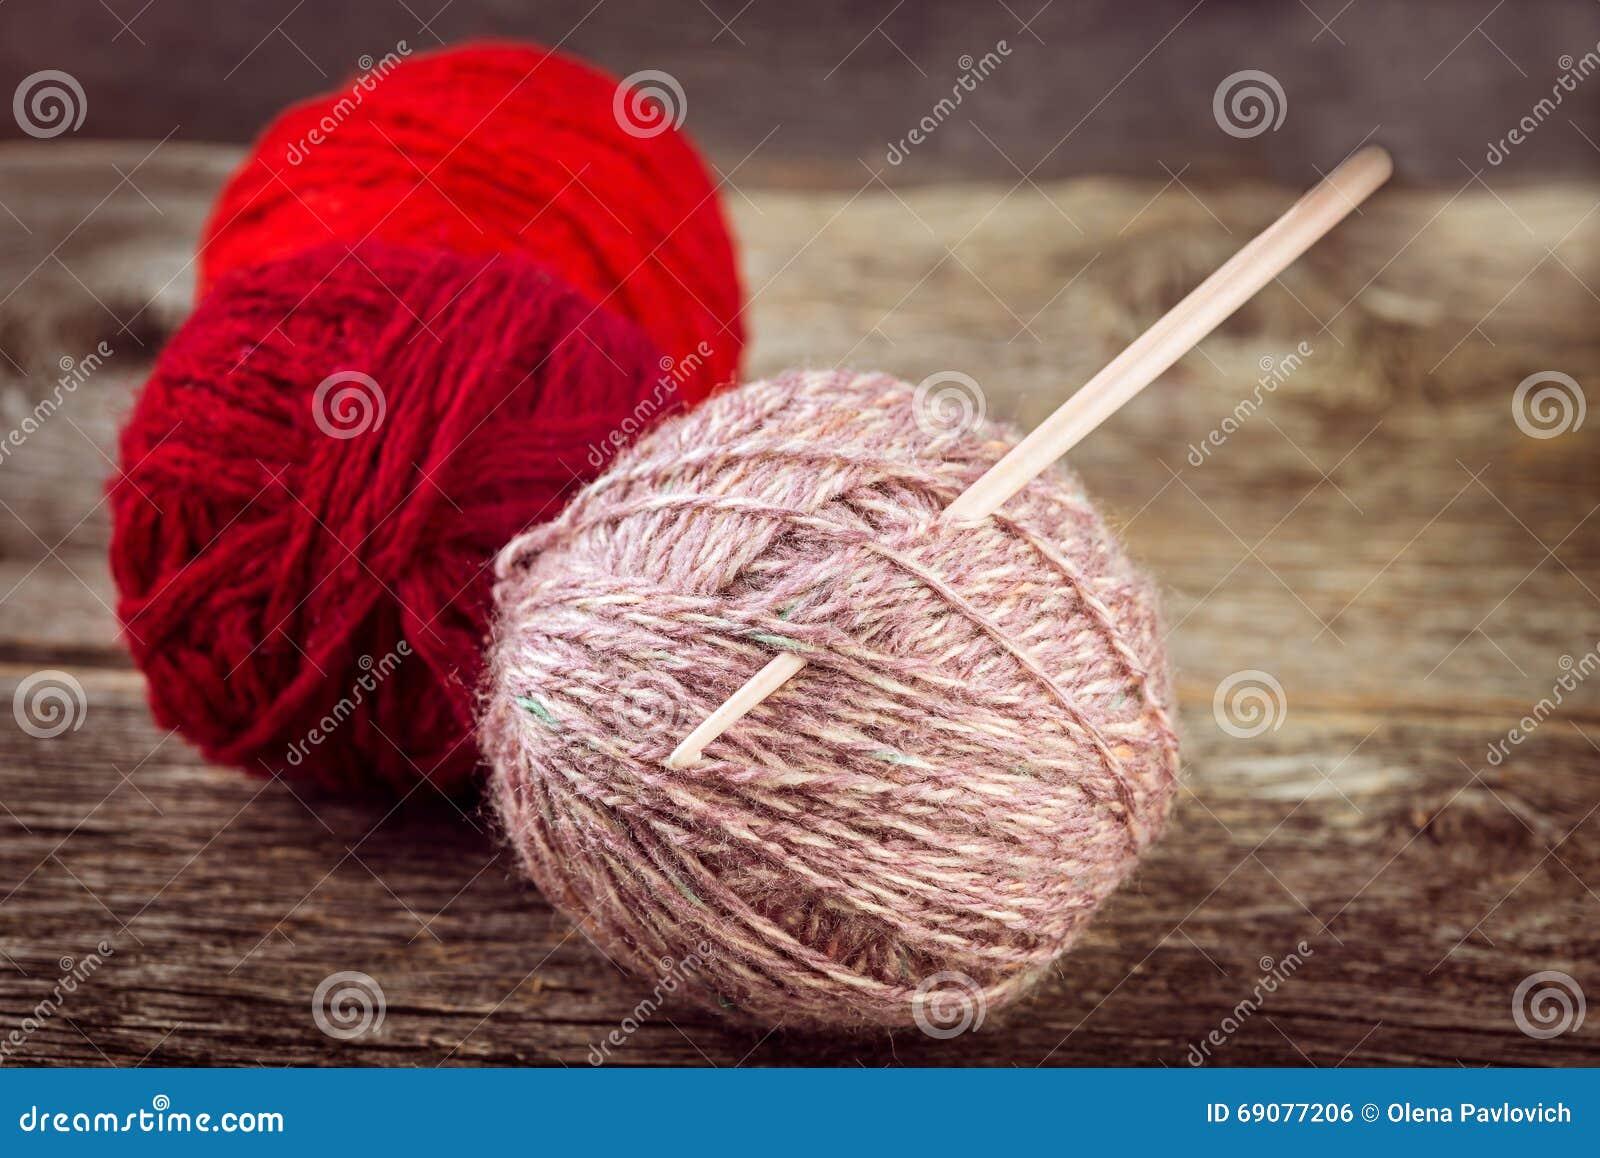 ball of yarn crochet - photo #23